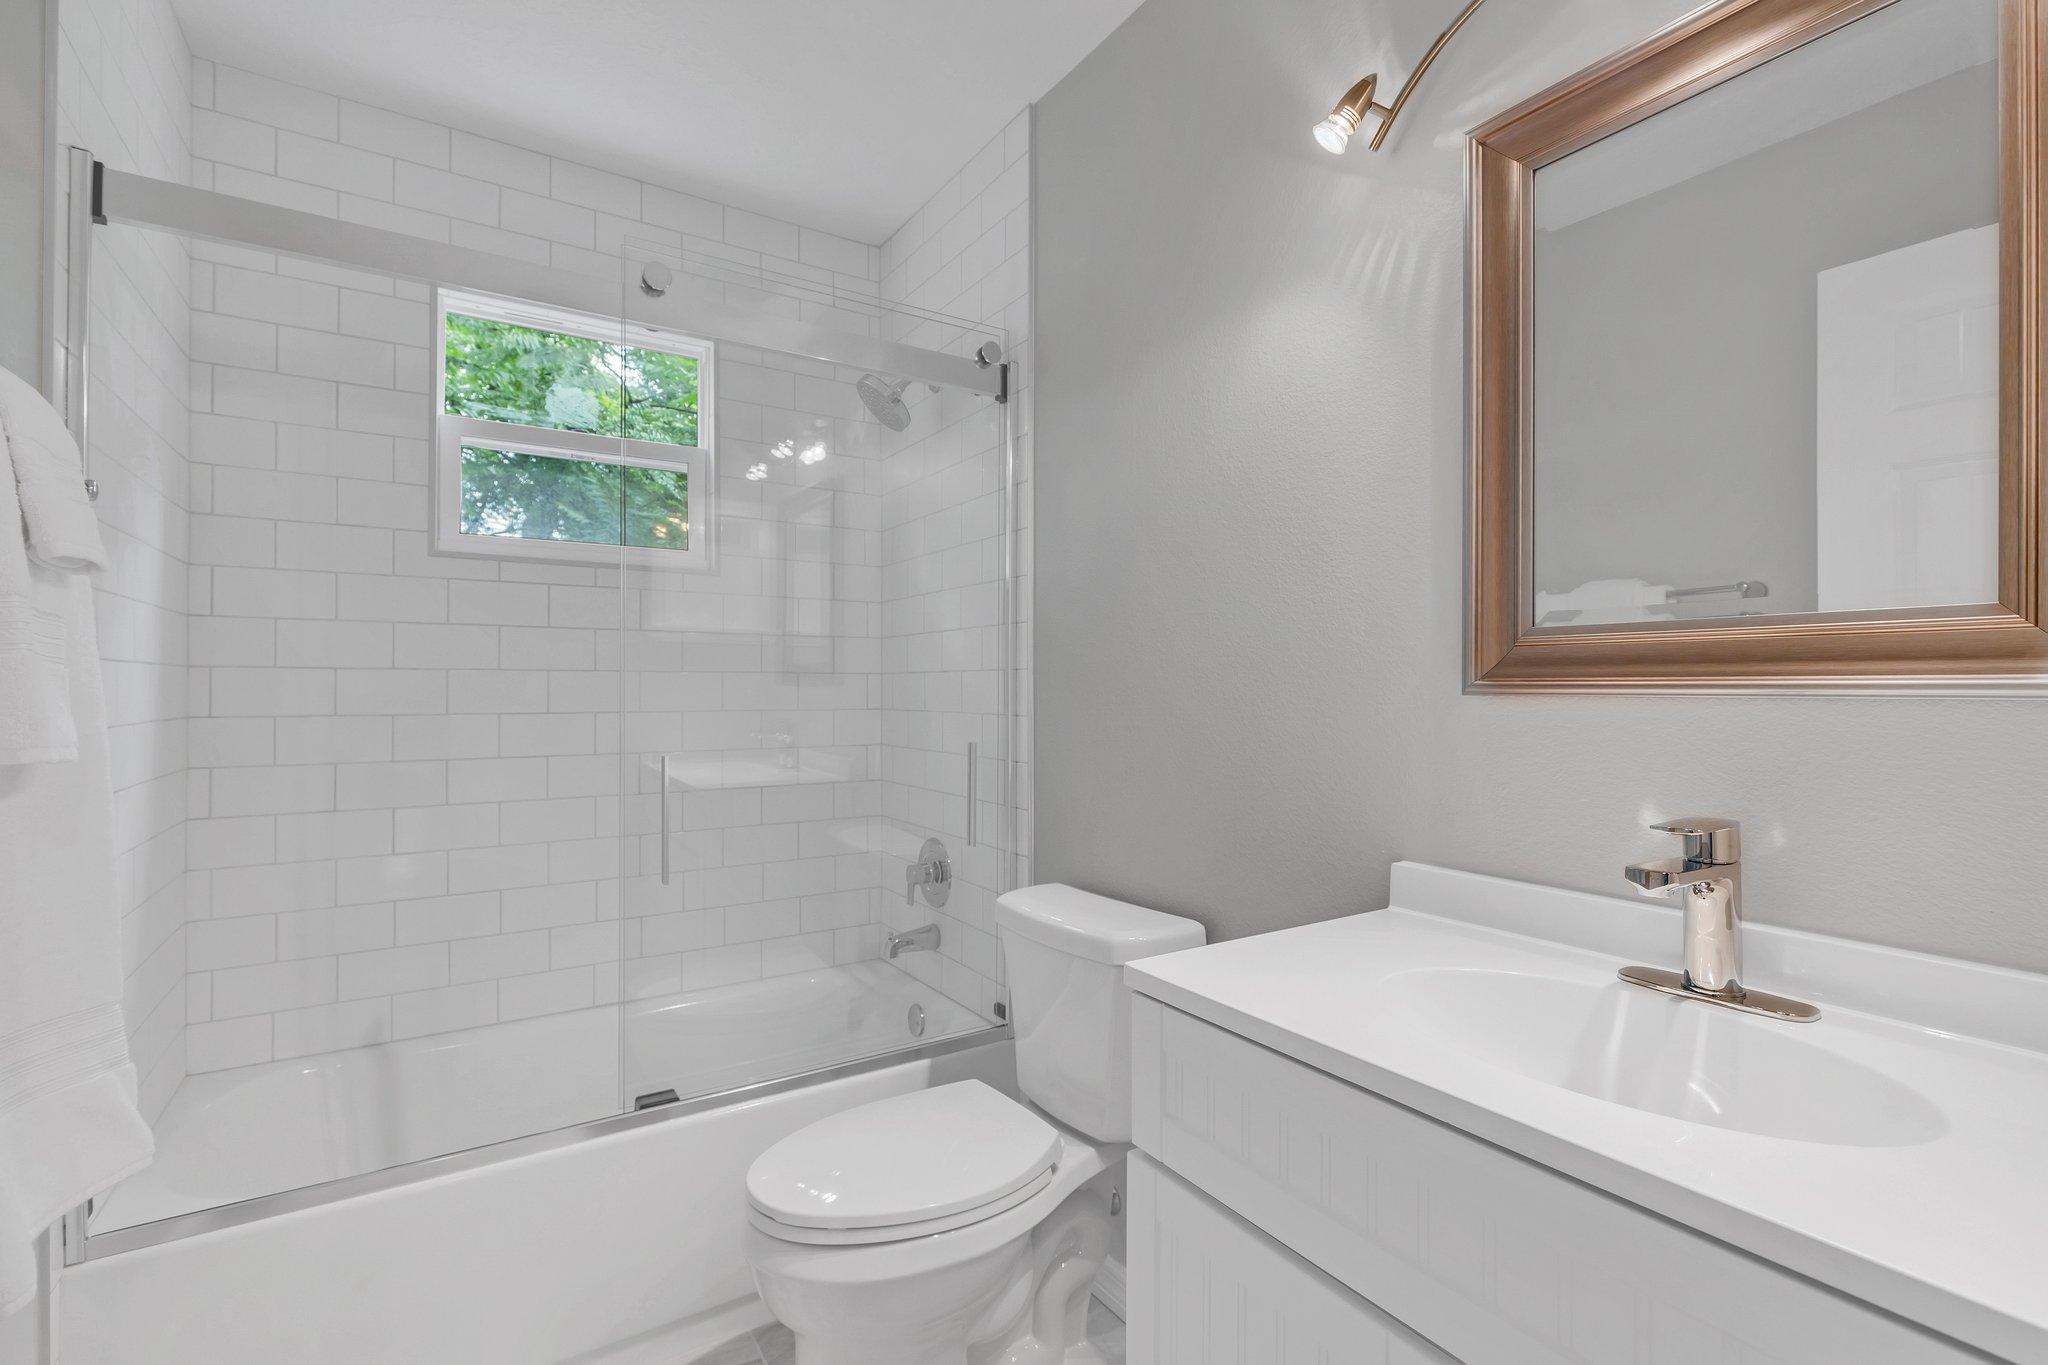 Upstairs hall bath fully upgraded